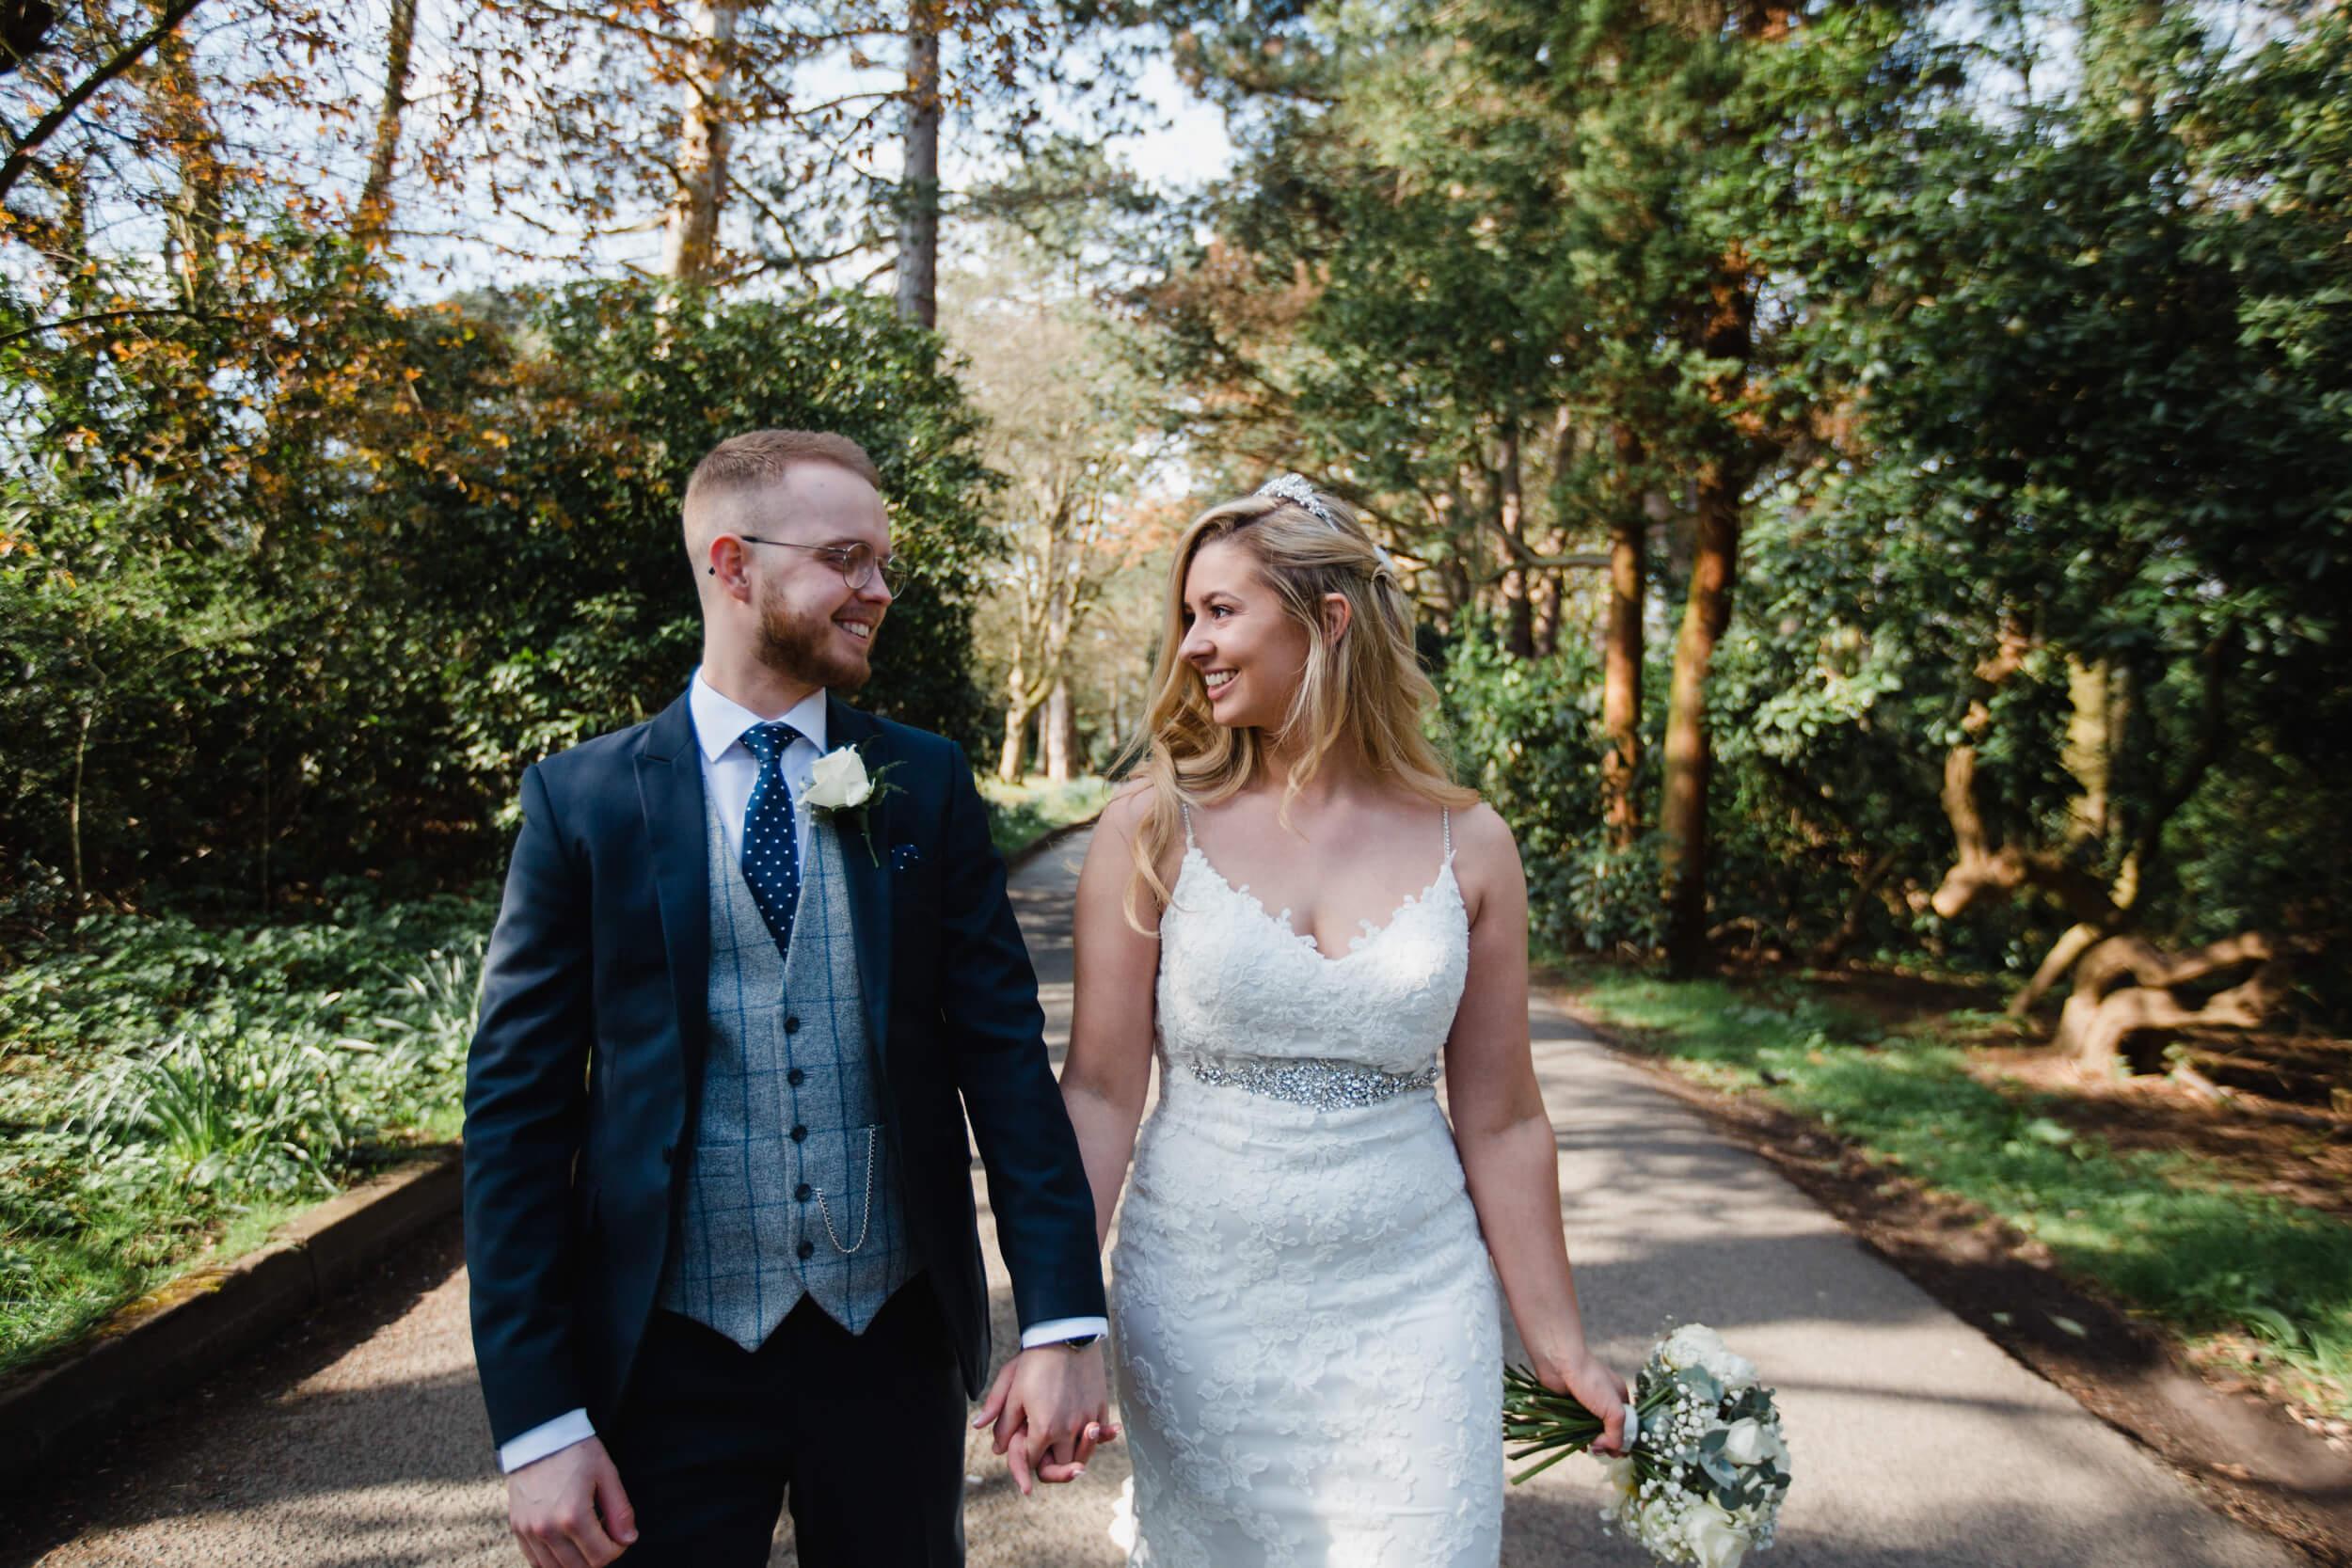 newly married couple walking towards carpark